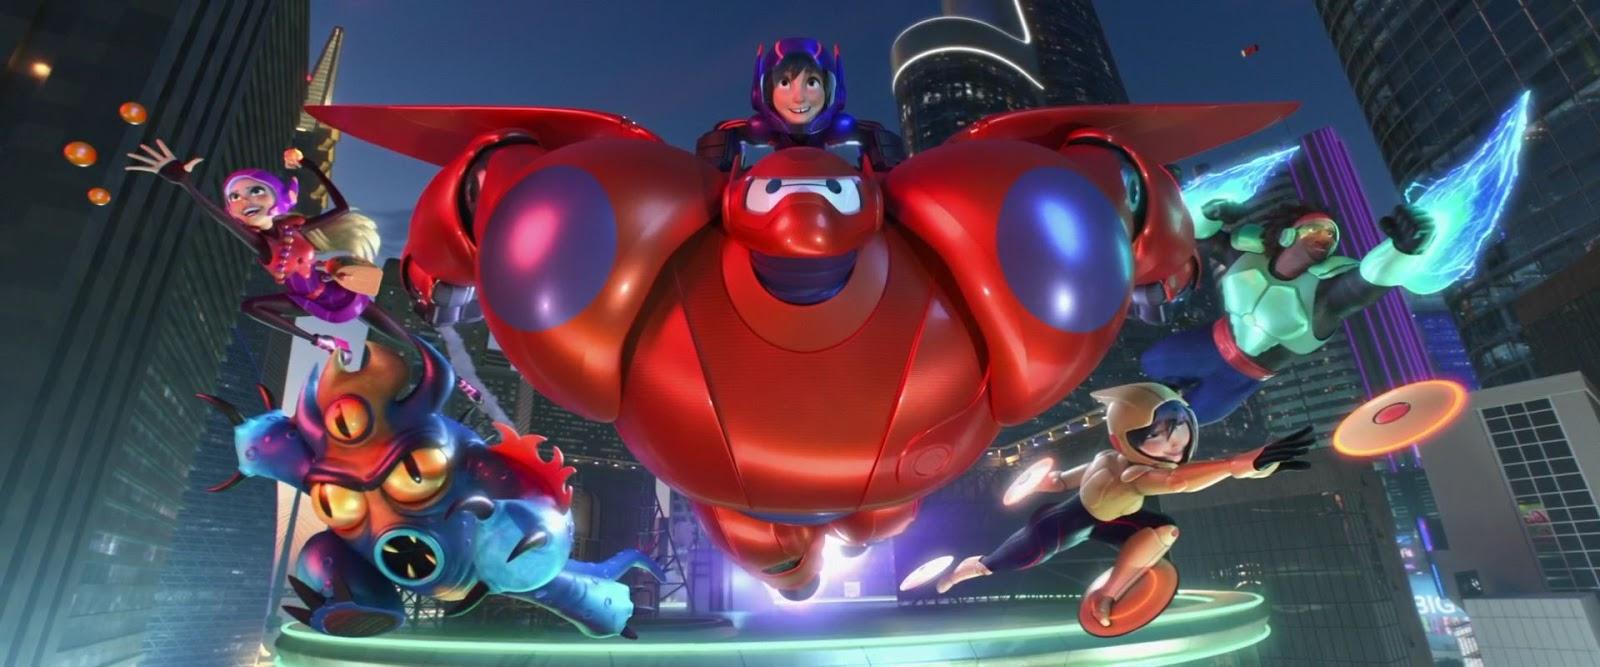 Punch Drunk Critics: Honest Trailer For 'Big Hero 6', The